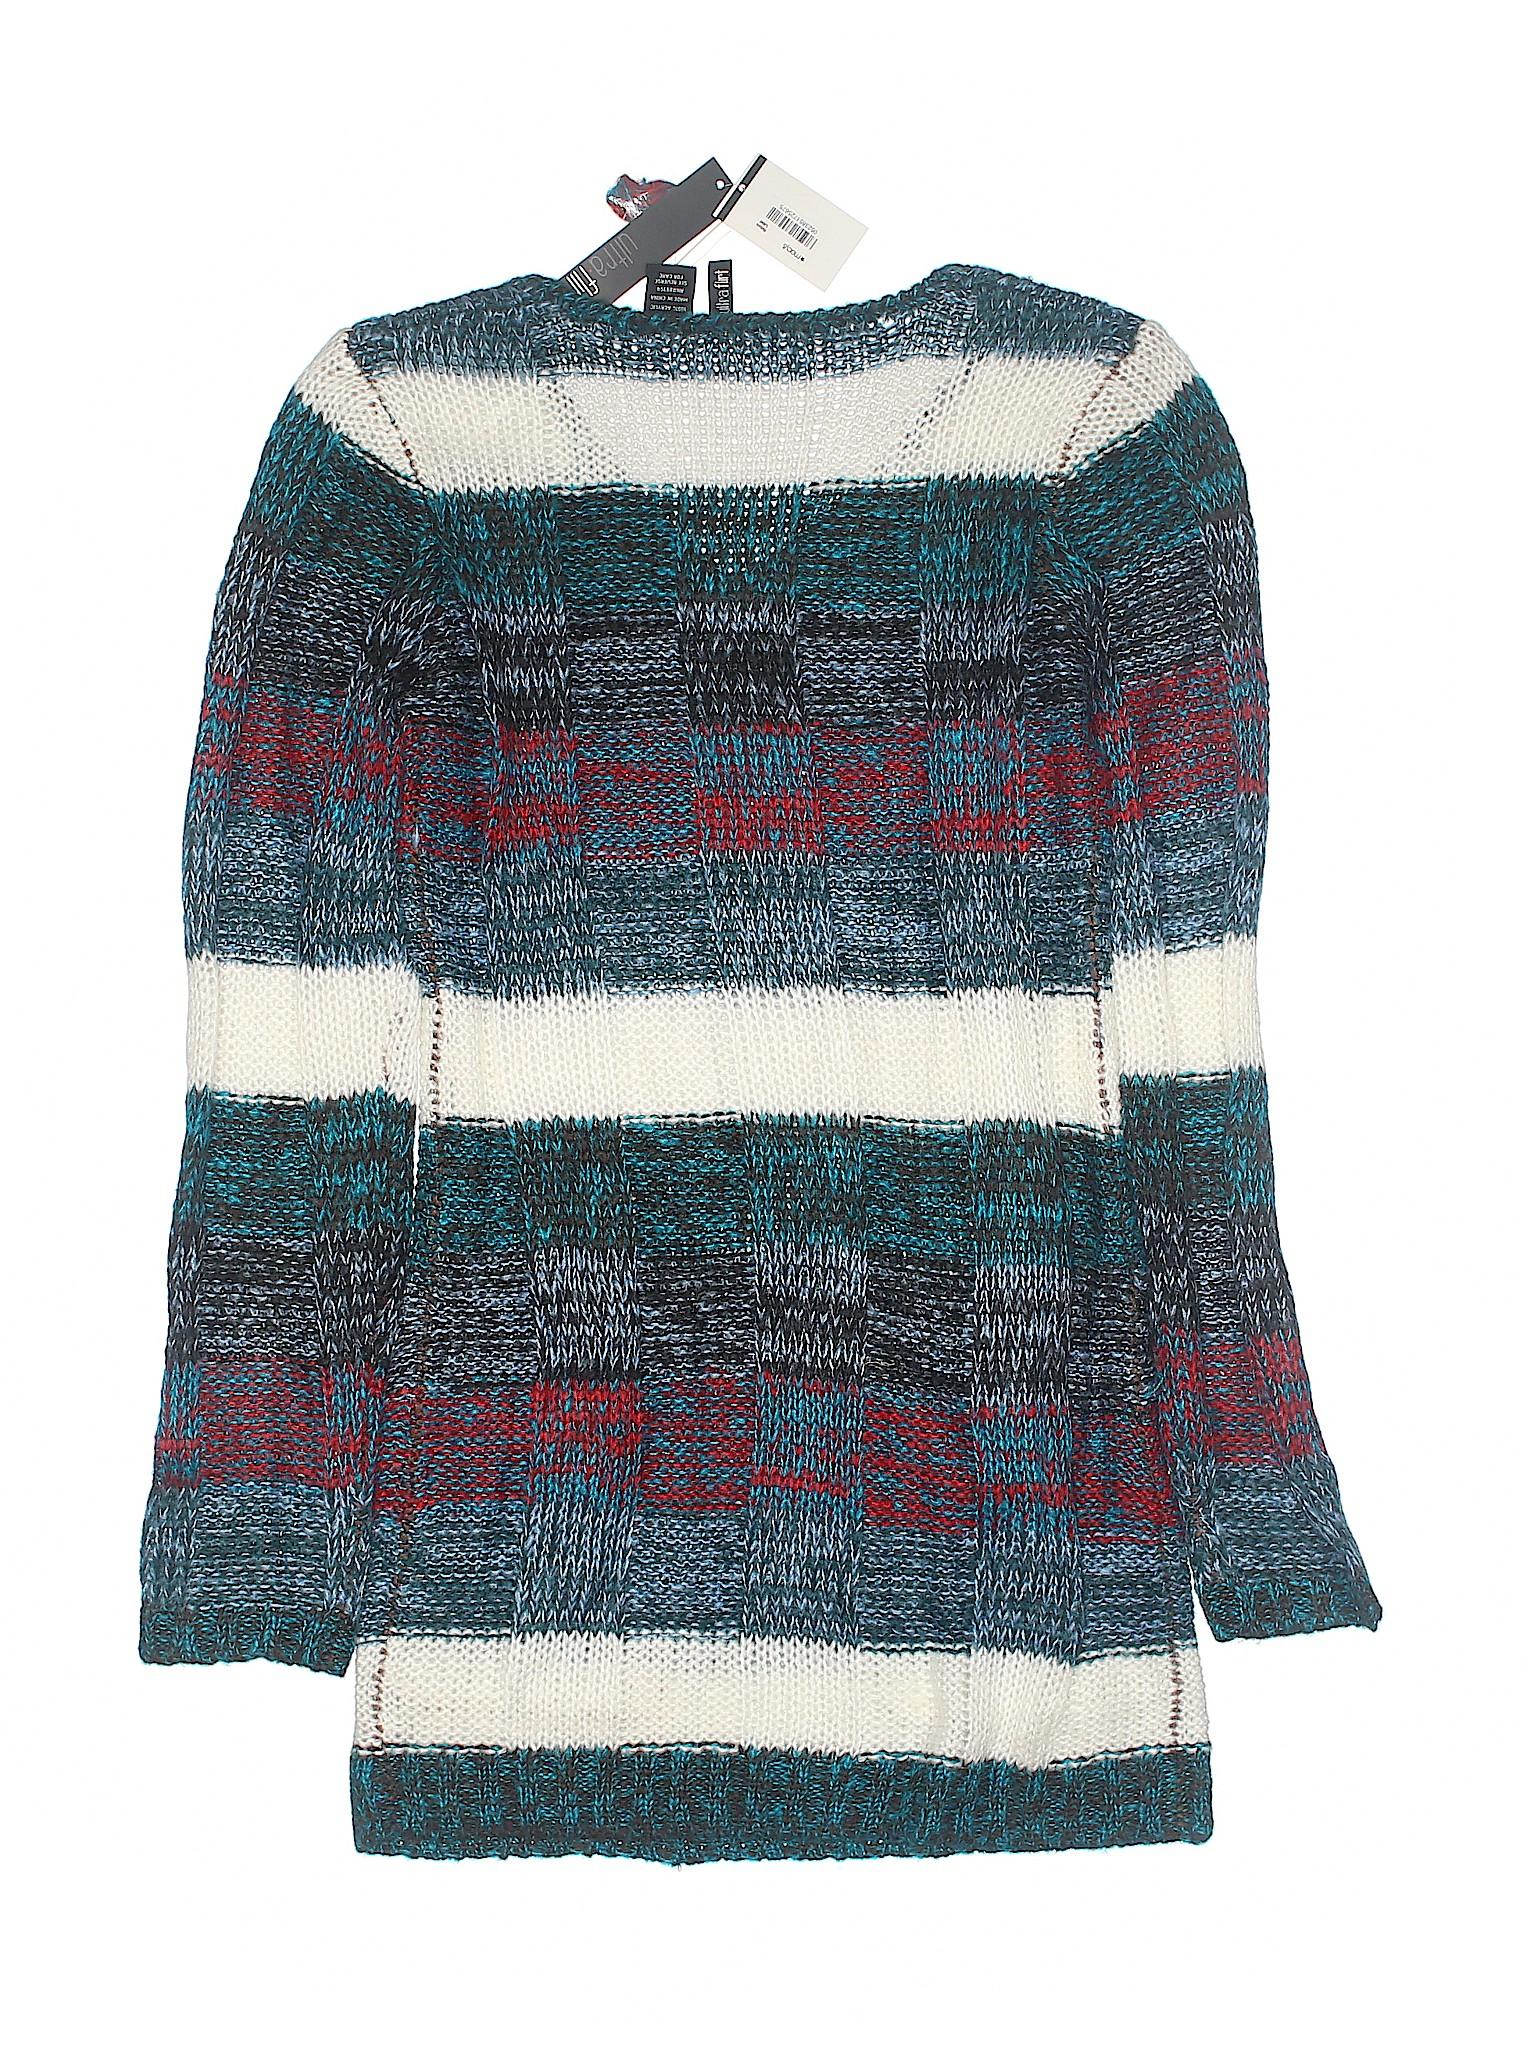 Sweater Pullover Boutique Boutique Flirt Ultra Ultra 6zqXwxI5I